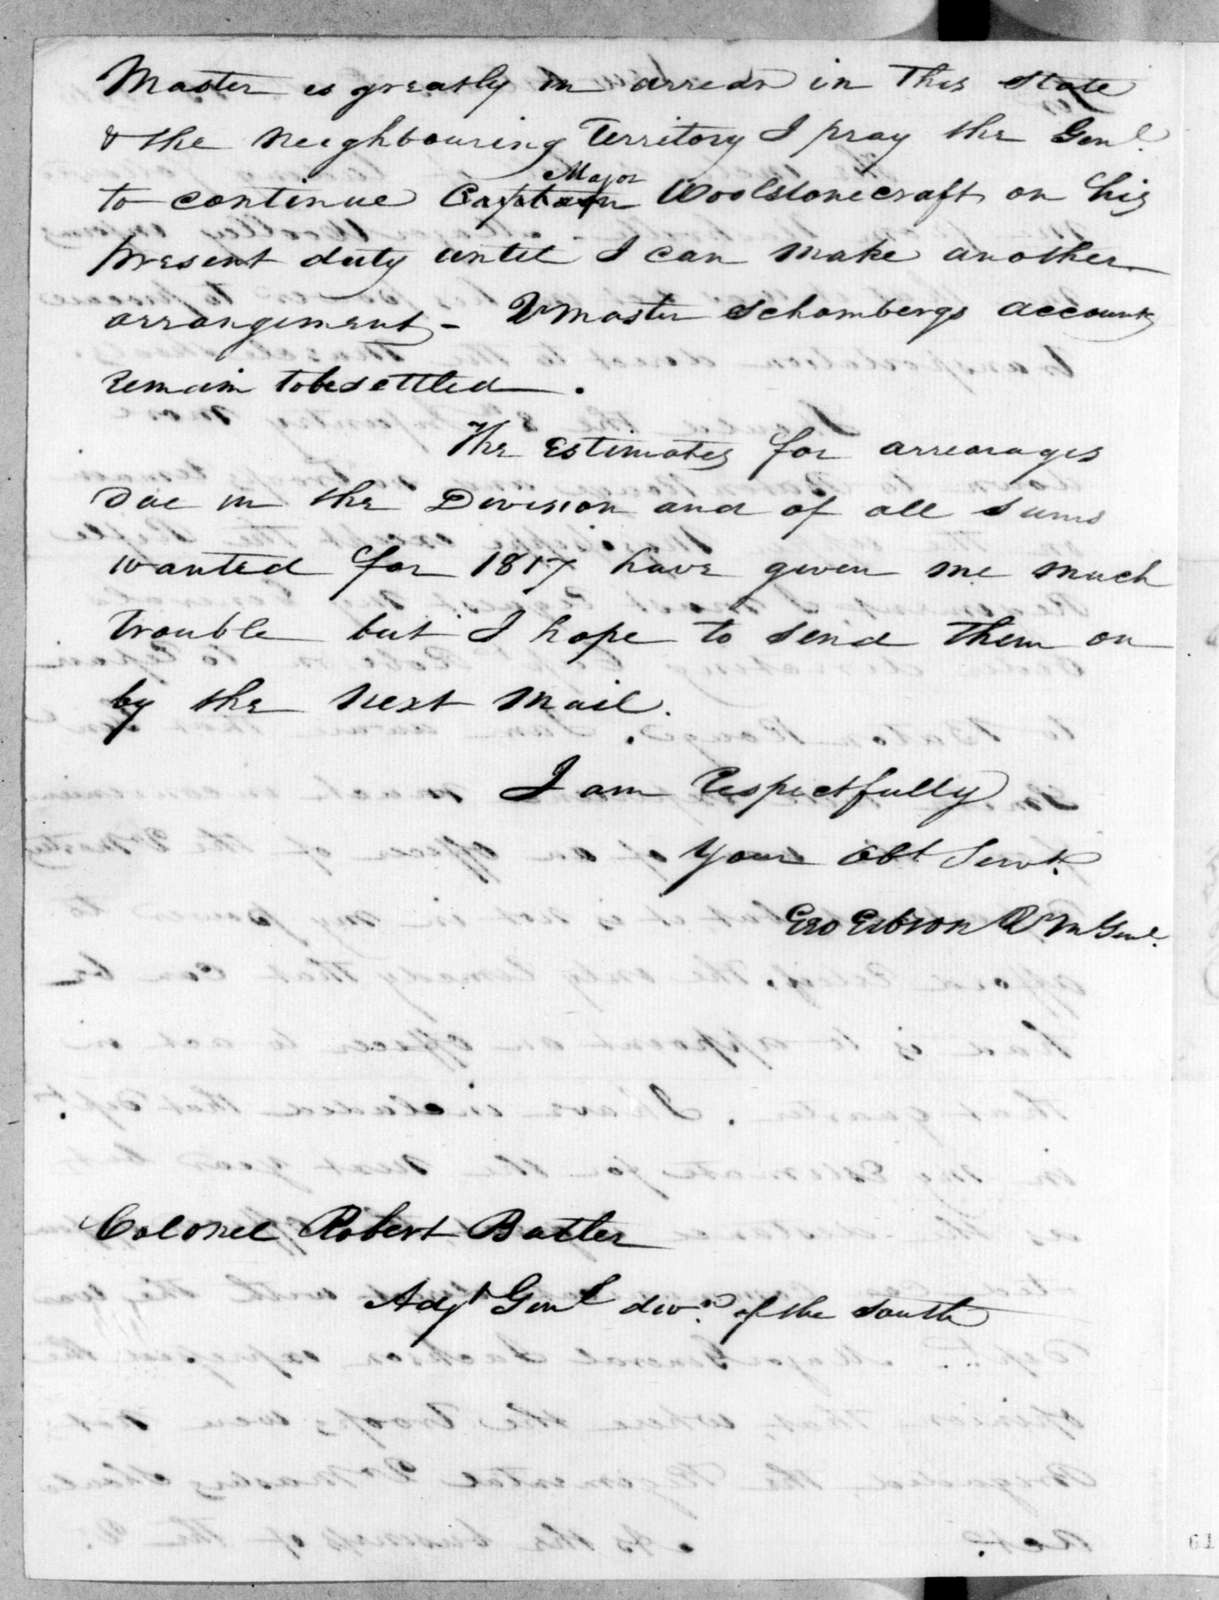 George Gibson to Robert Butler, December 15, 1816